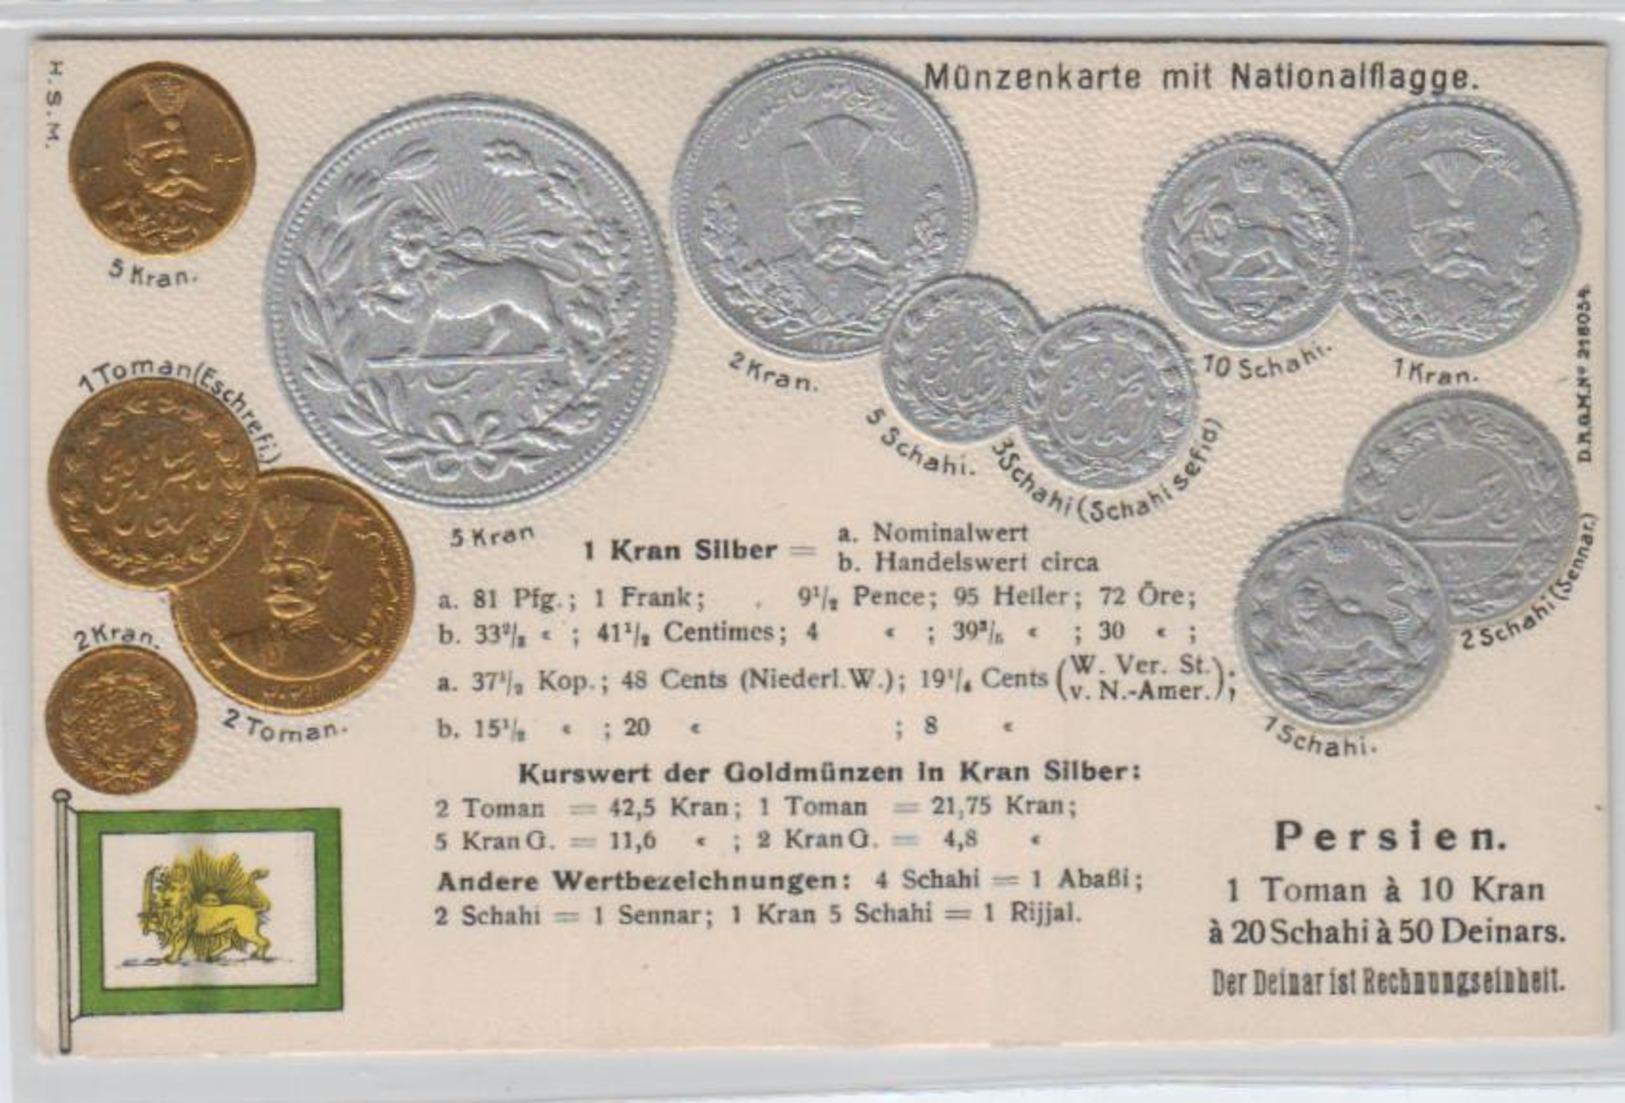 Motiv-MünzenPräge - Persien    - Schöne Alte Karte ....   (ka5297  ) Siehe Scan - Monnaies (représentations)